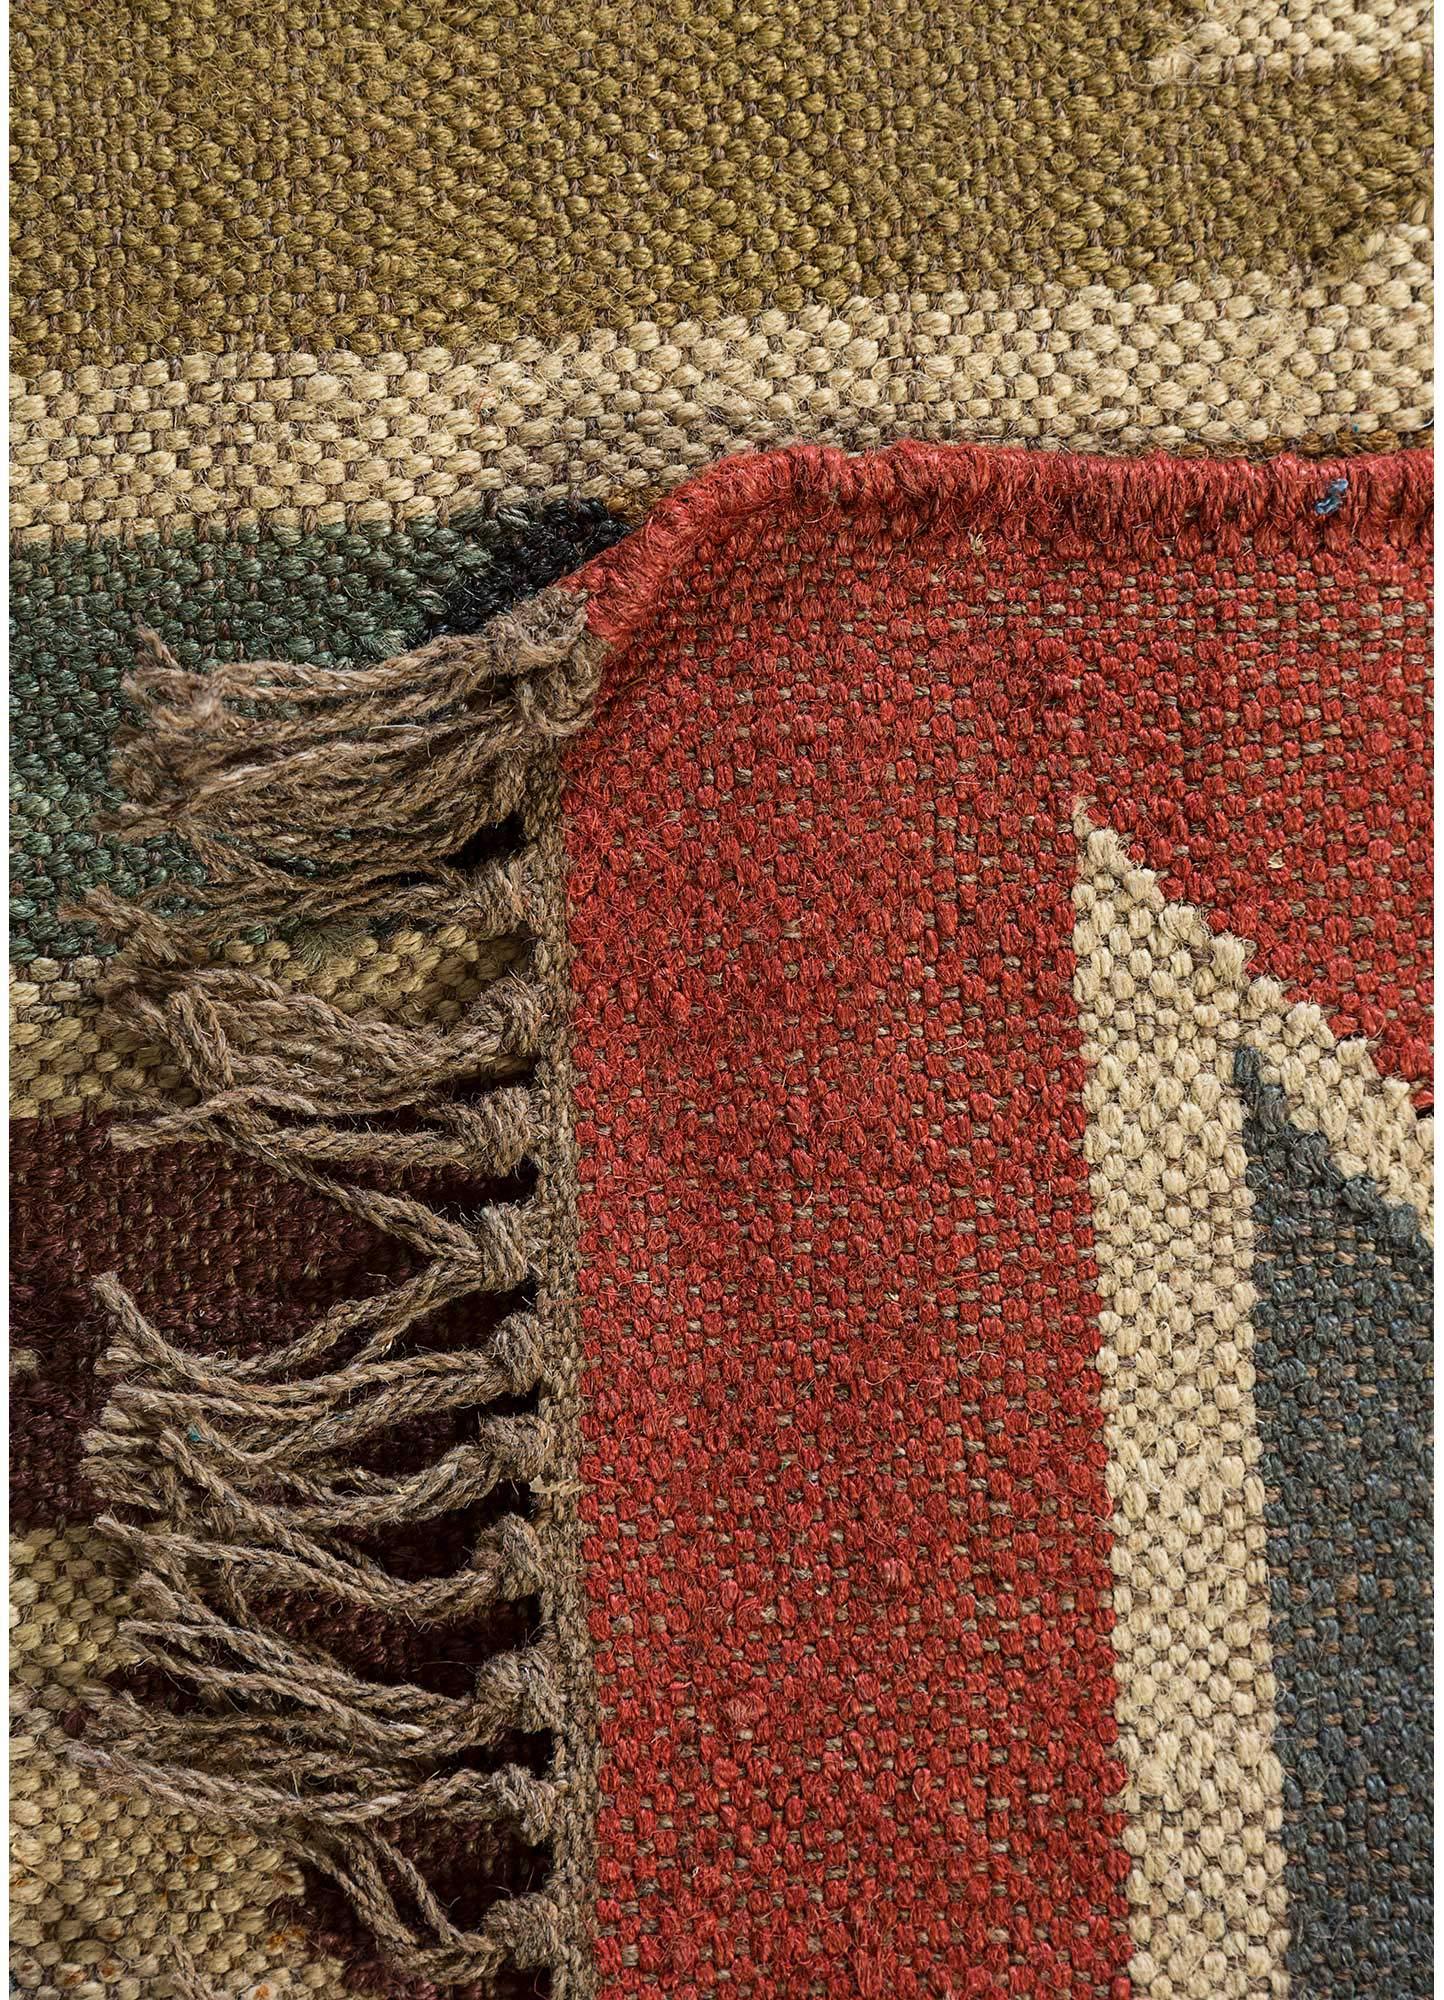 bedouin red and orange jute and hemp jute rugs Rug - Perspective